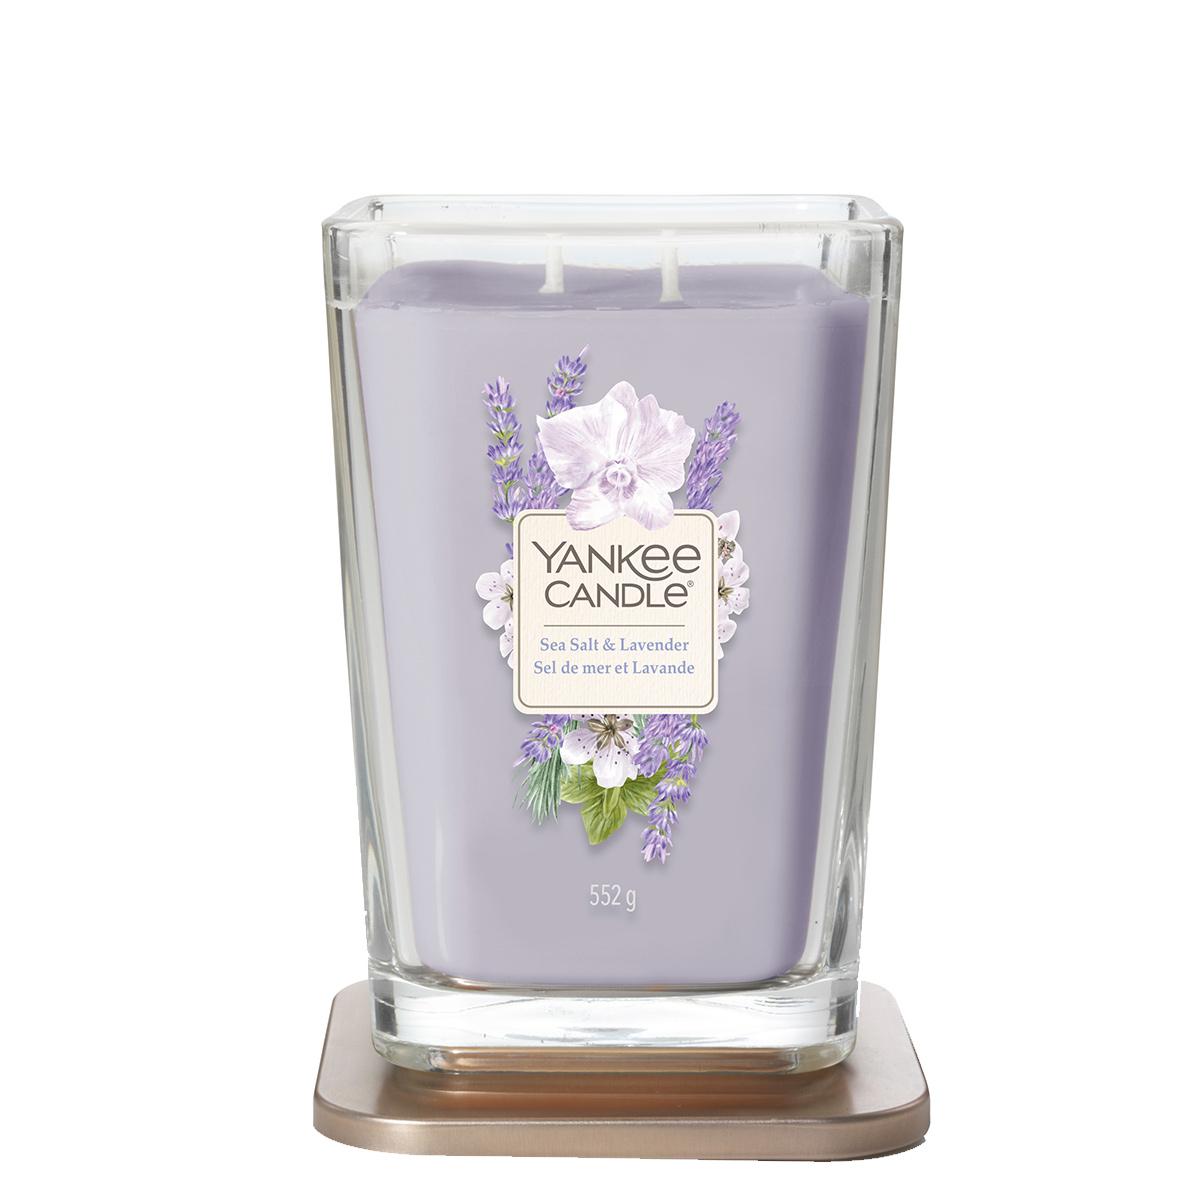 Elevation-Sea-Salt-and-Lavender-Large-Square-Candle-1628651E-Lid